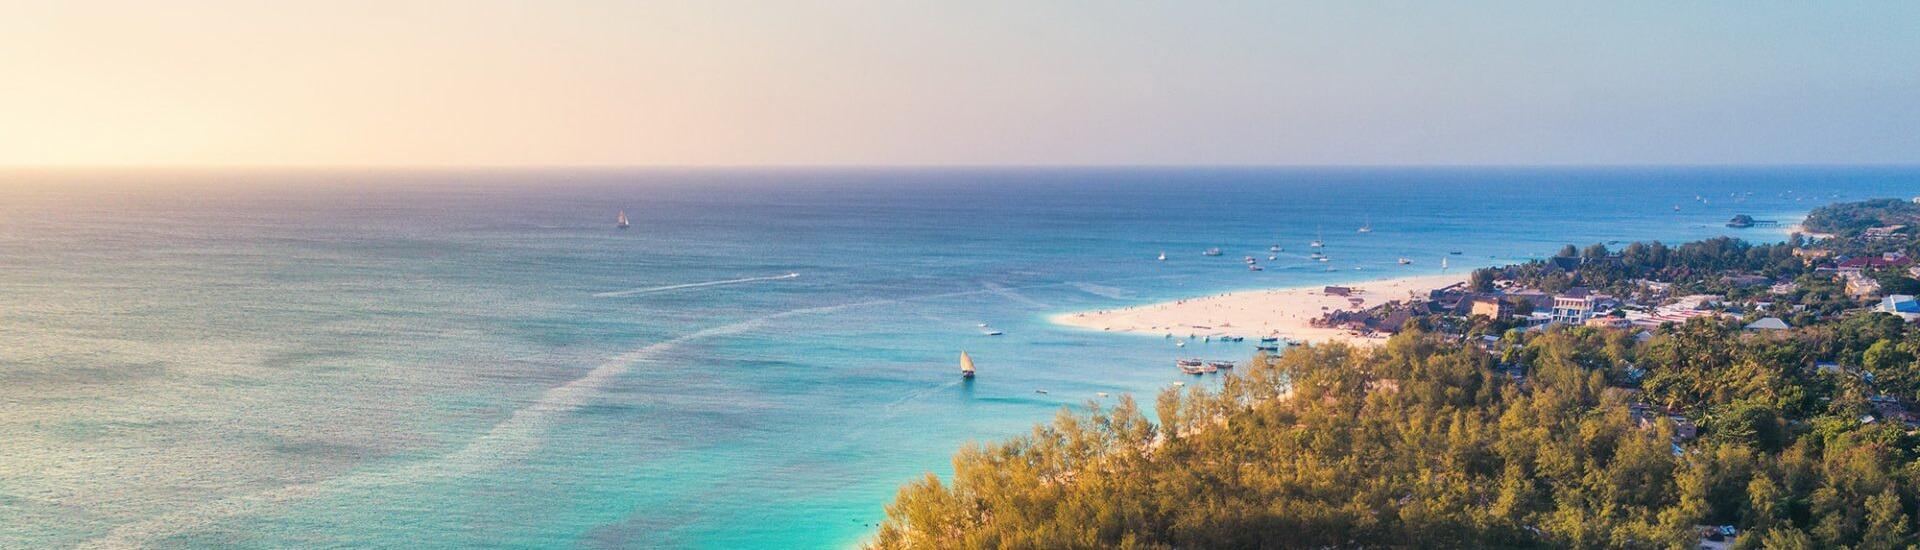 Nyika Discovery - Zanzibar island tours